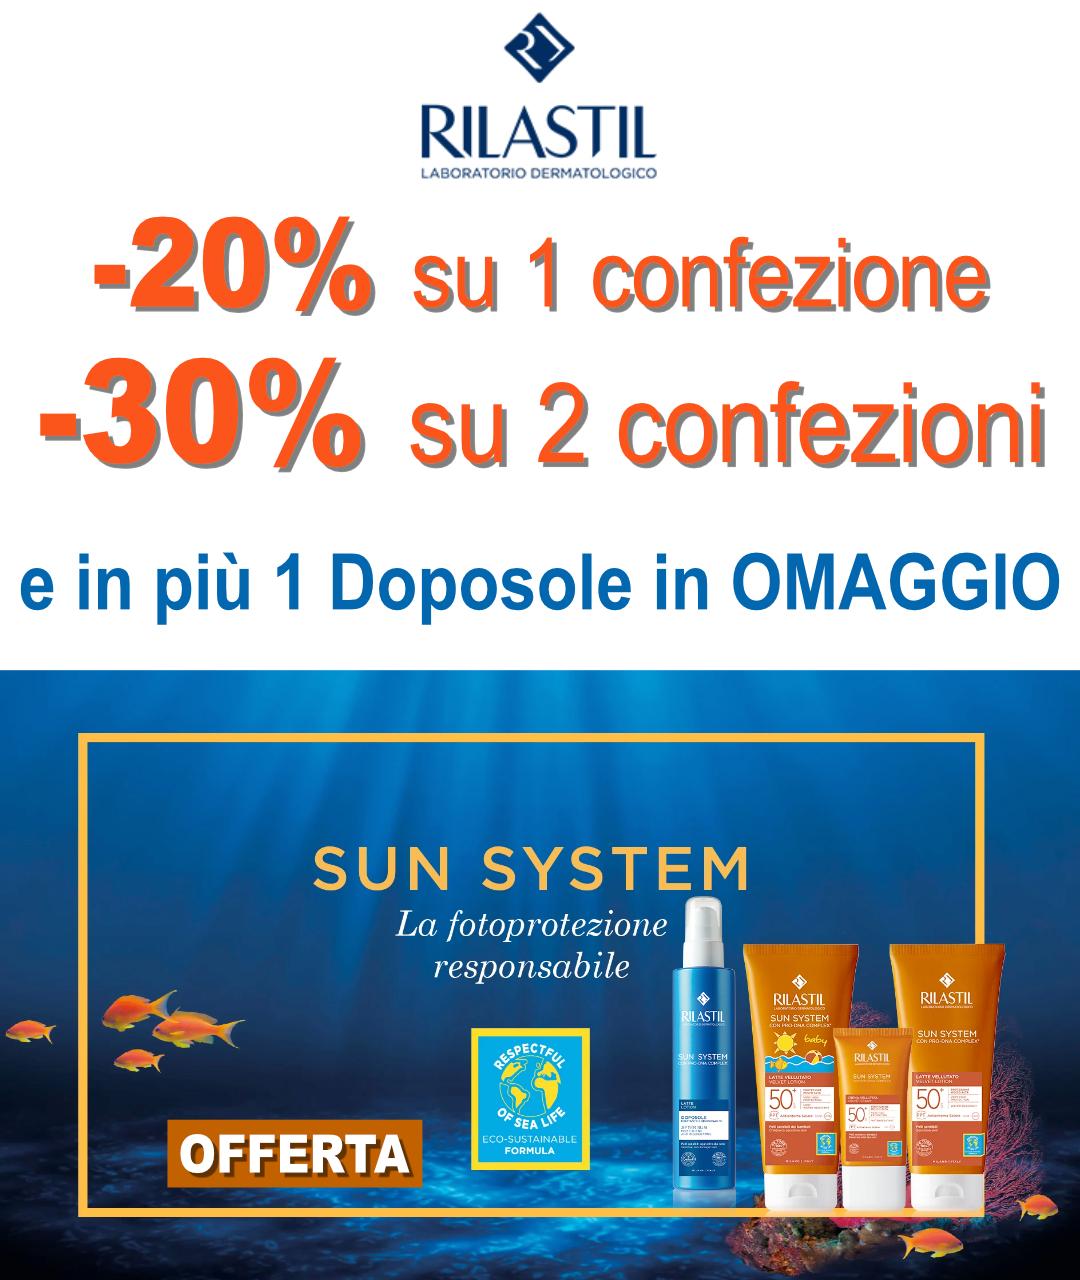 Rilastil-solari-06-21